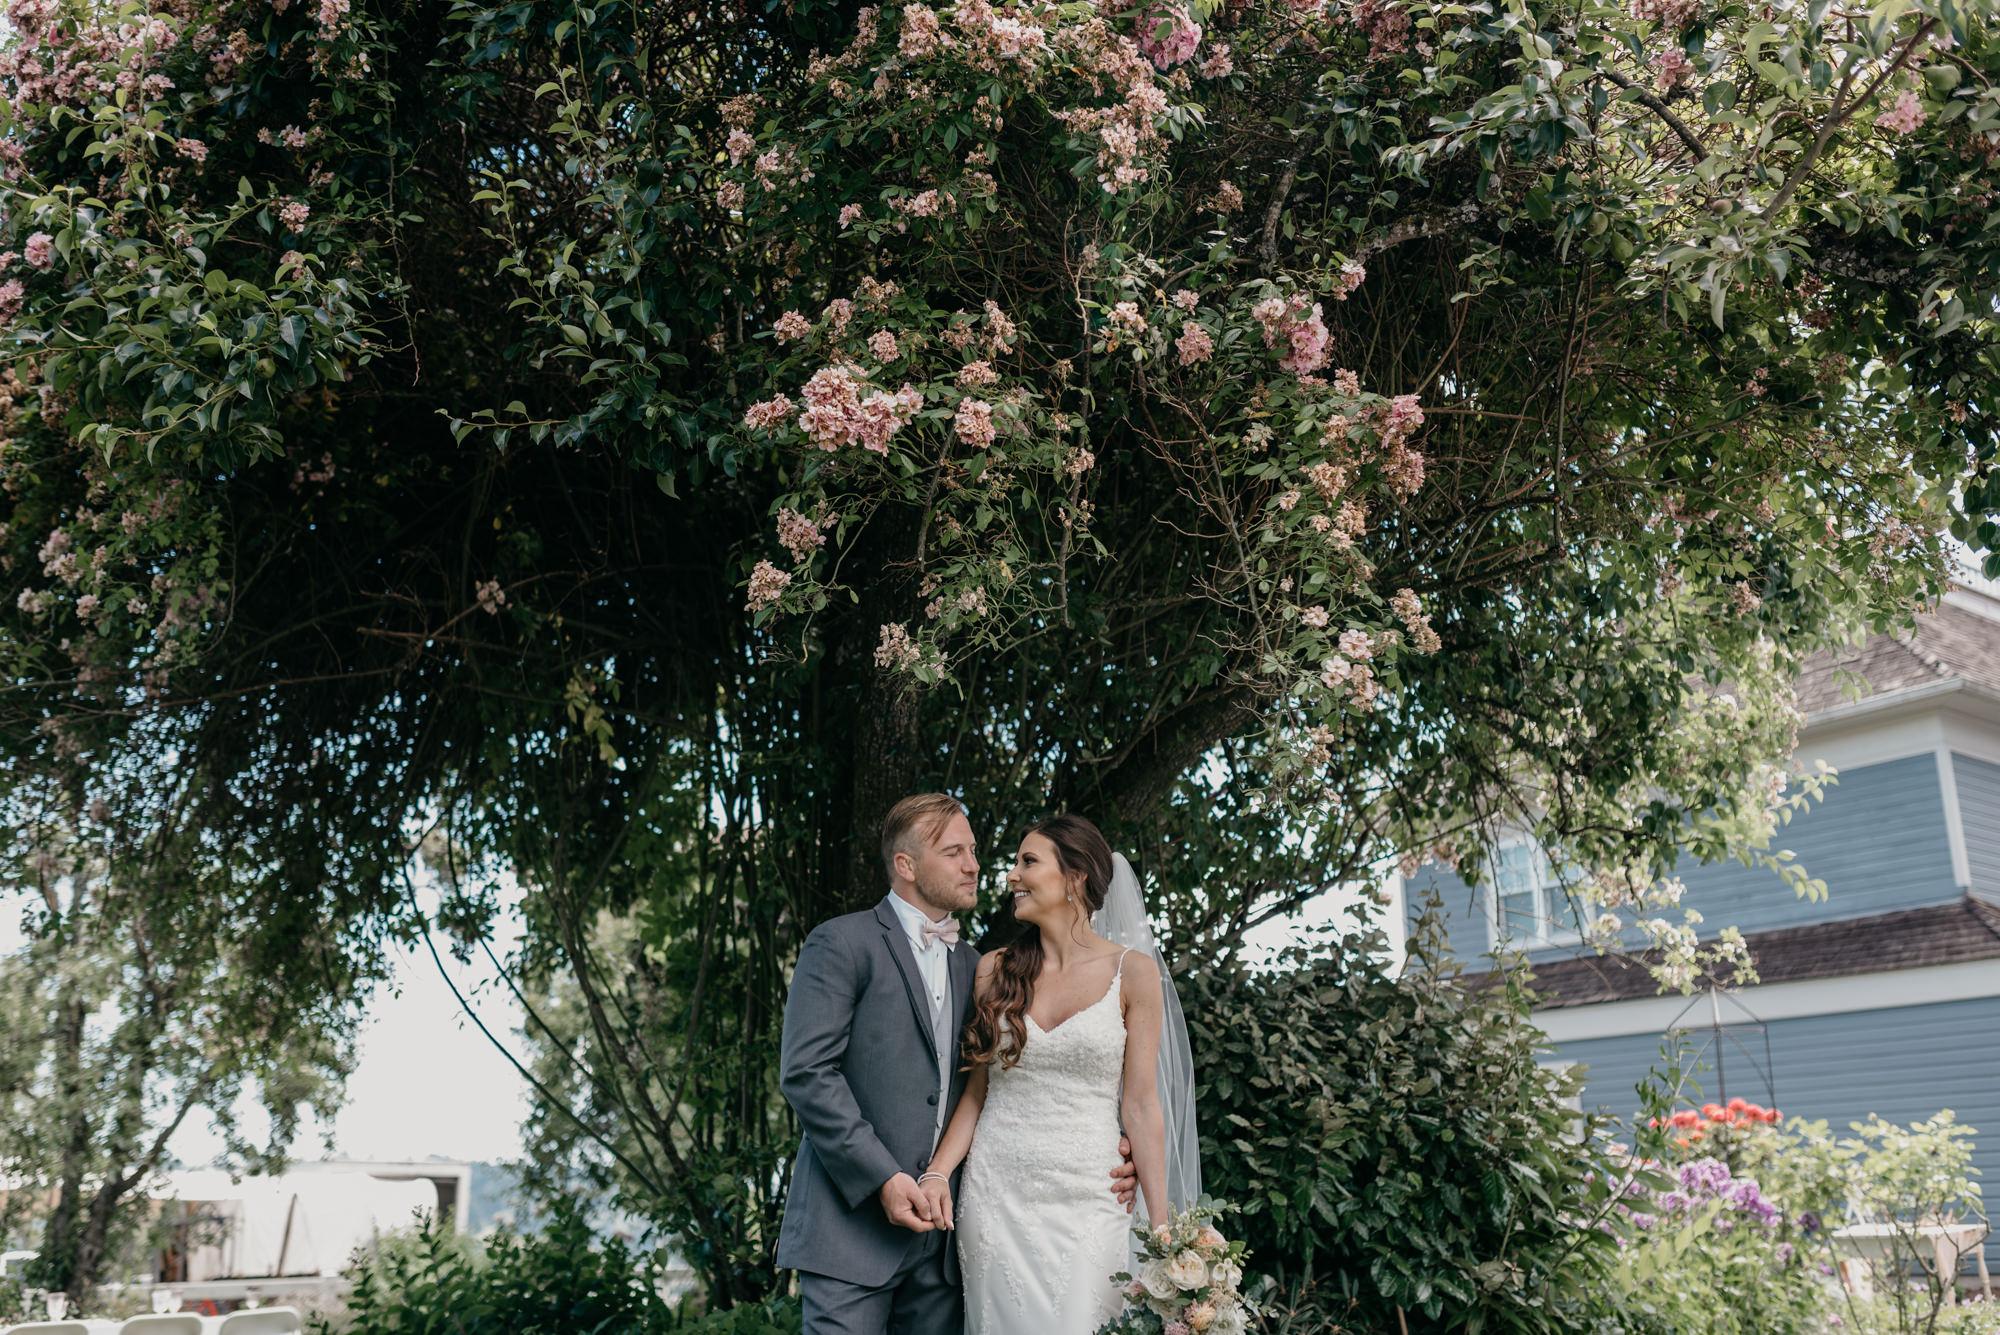 86-lake-oswego-wedding-portland-couple-rose-tree.jpg